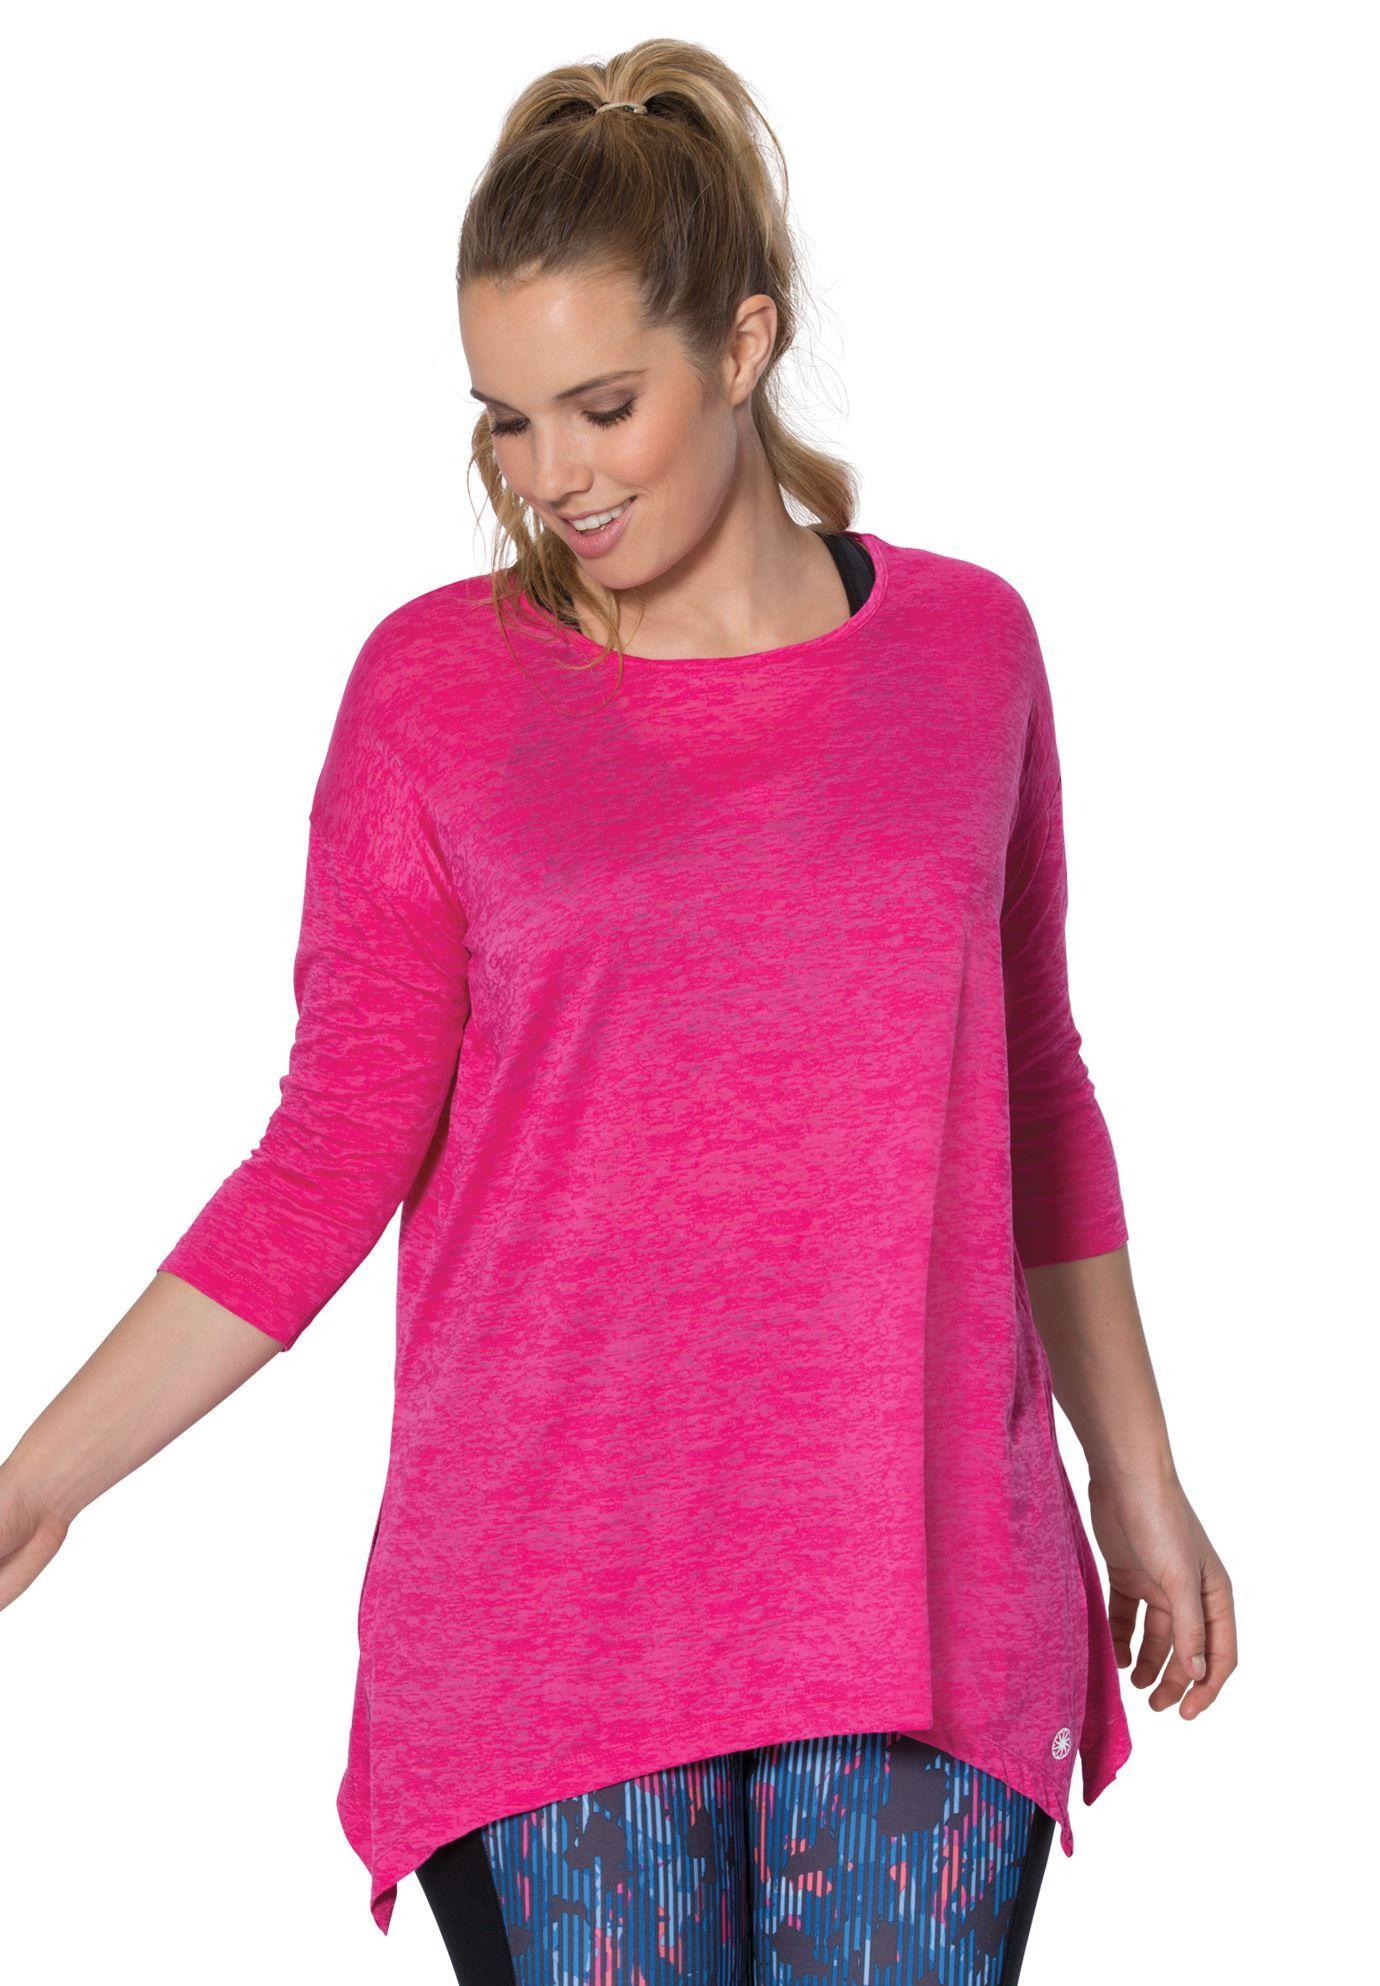 11b959d1cef Scoop neck burnout tunic by fullbeauty SPORT - Women's Plus Size Clothing